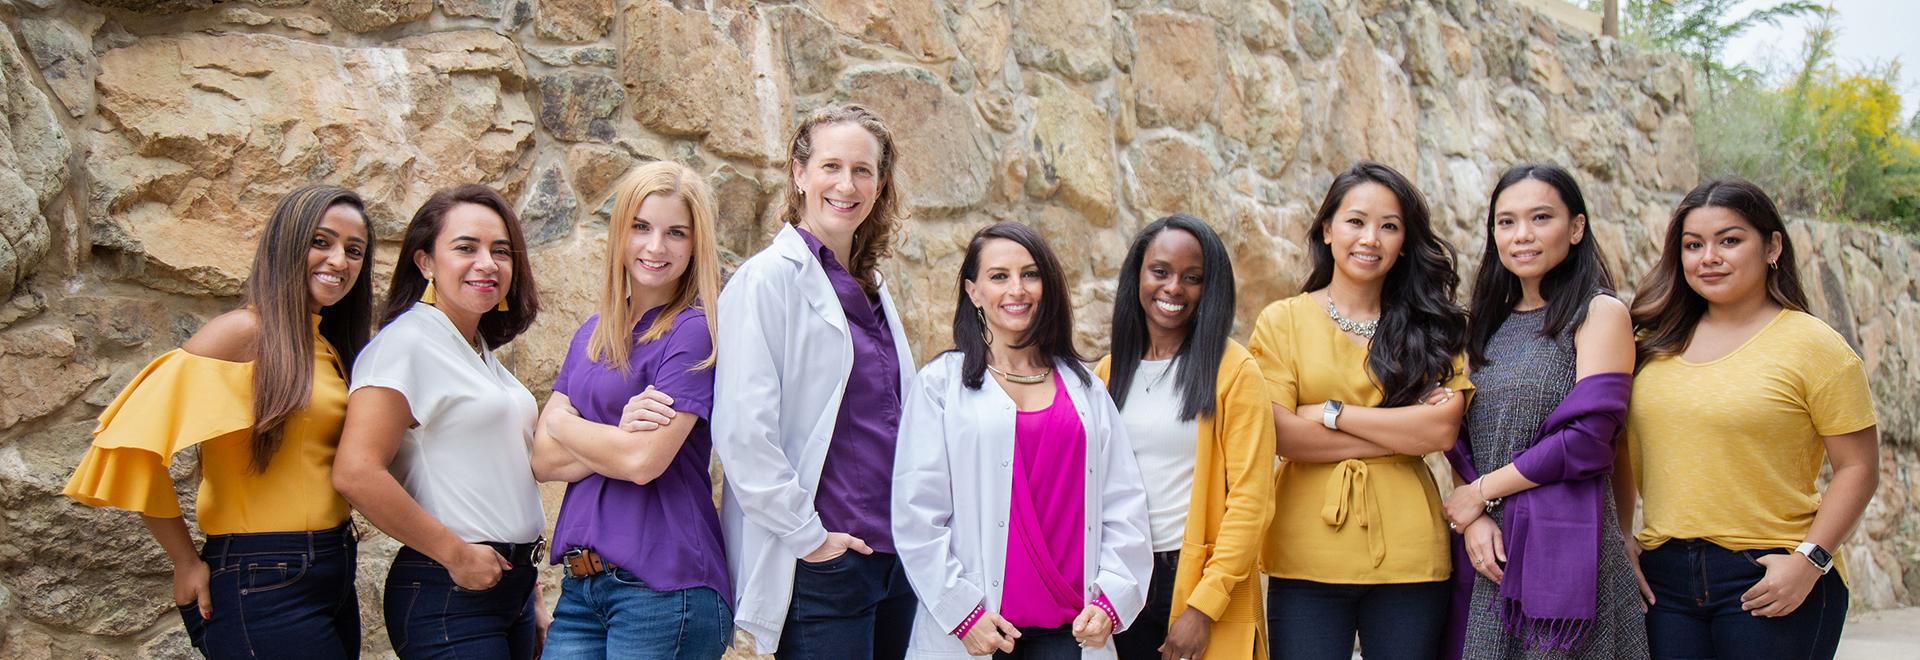 The team at Sunshine Dentists - Sunshine Dentists in Burke, VA